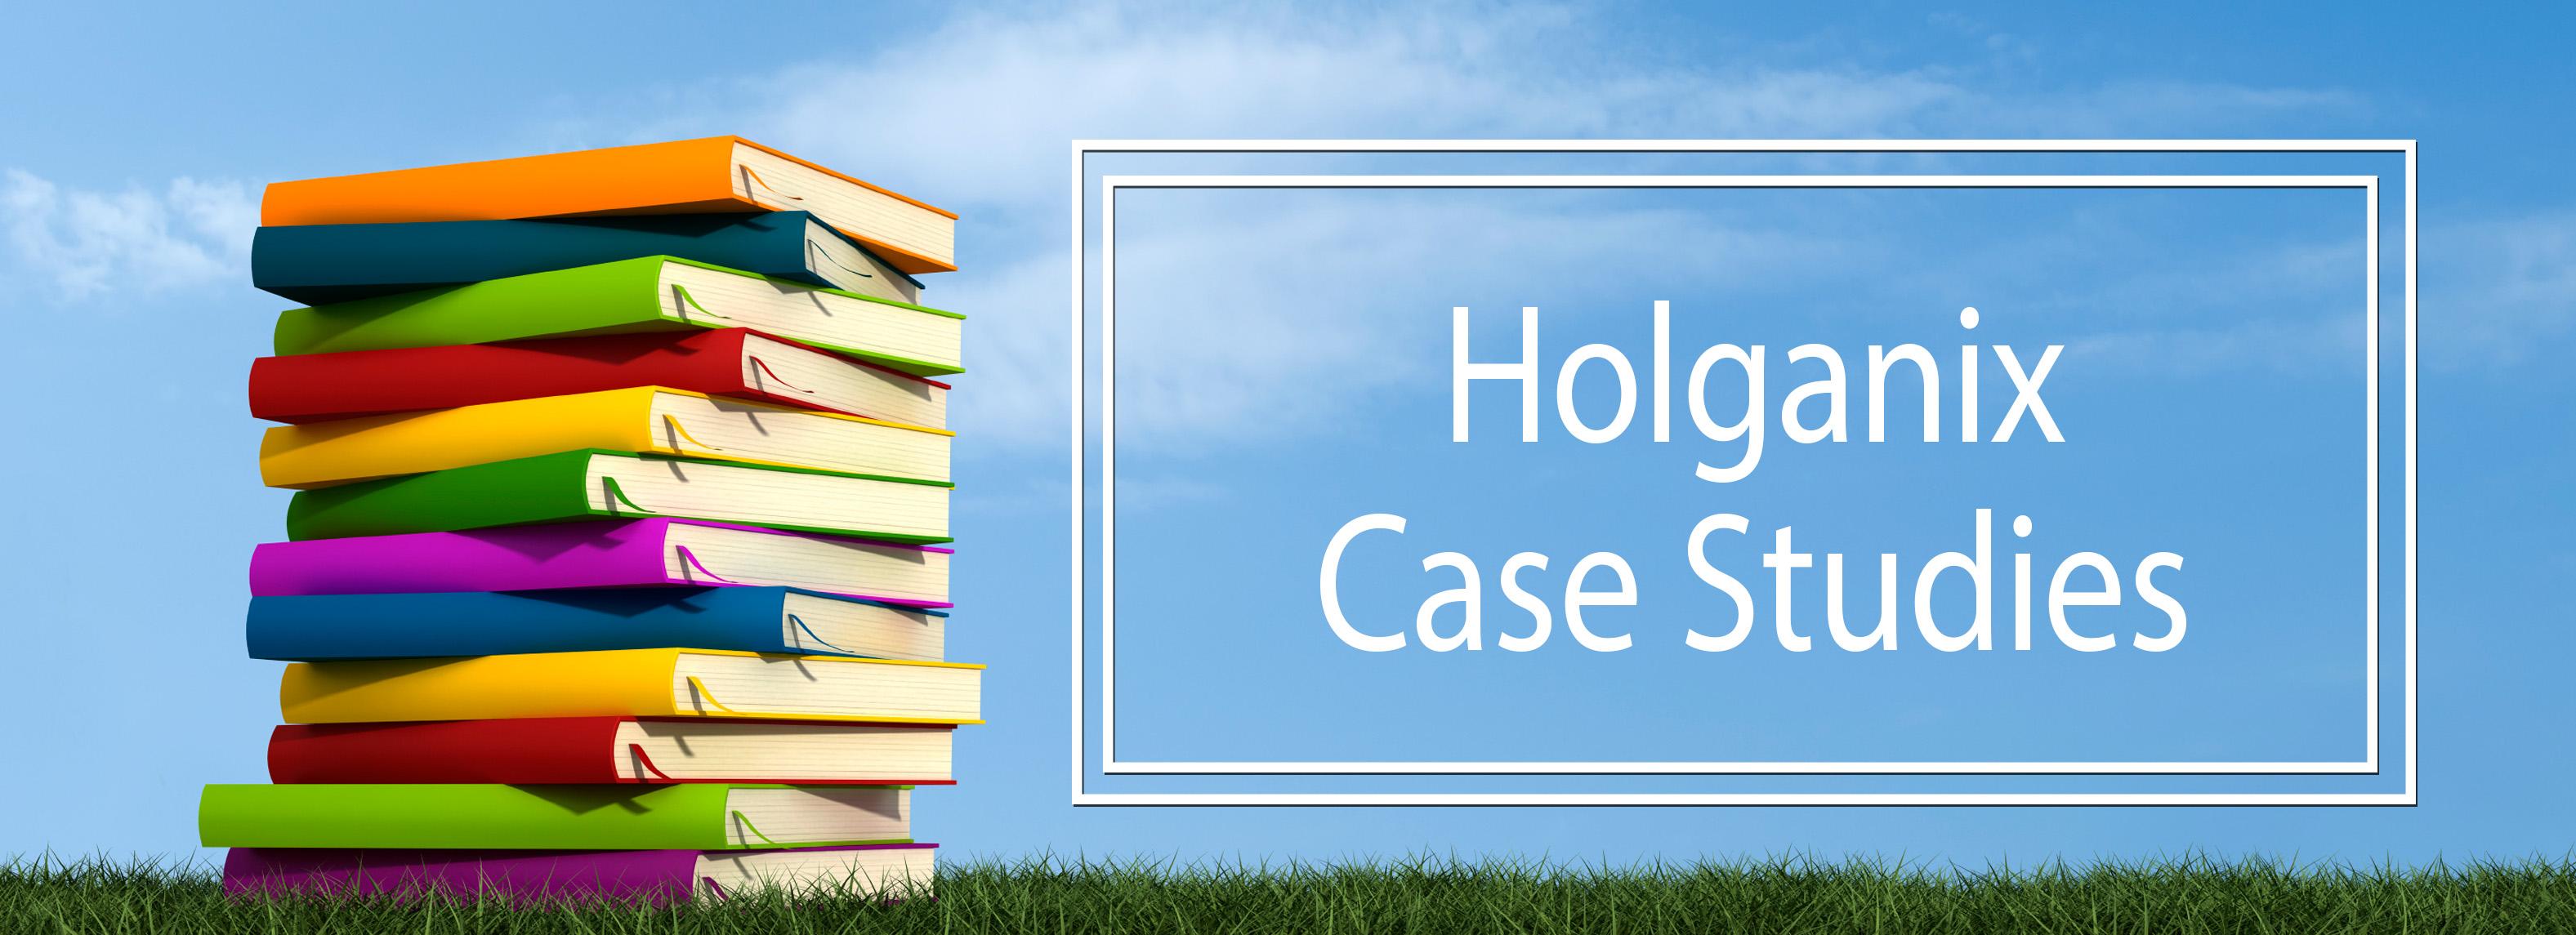 Holganix_Case_Studies_with_books.jpg